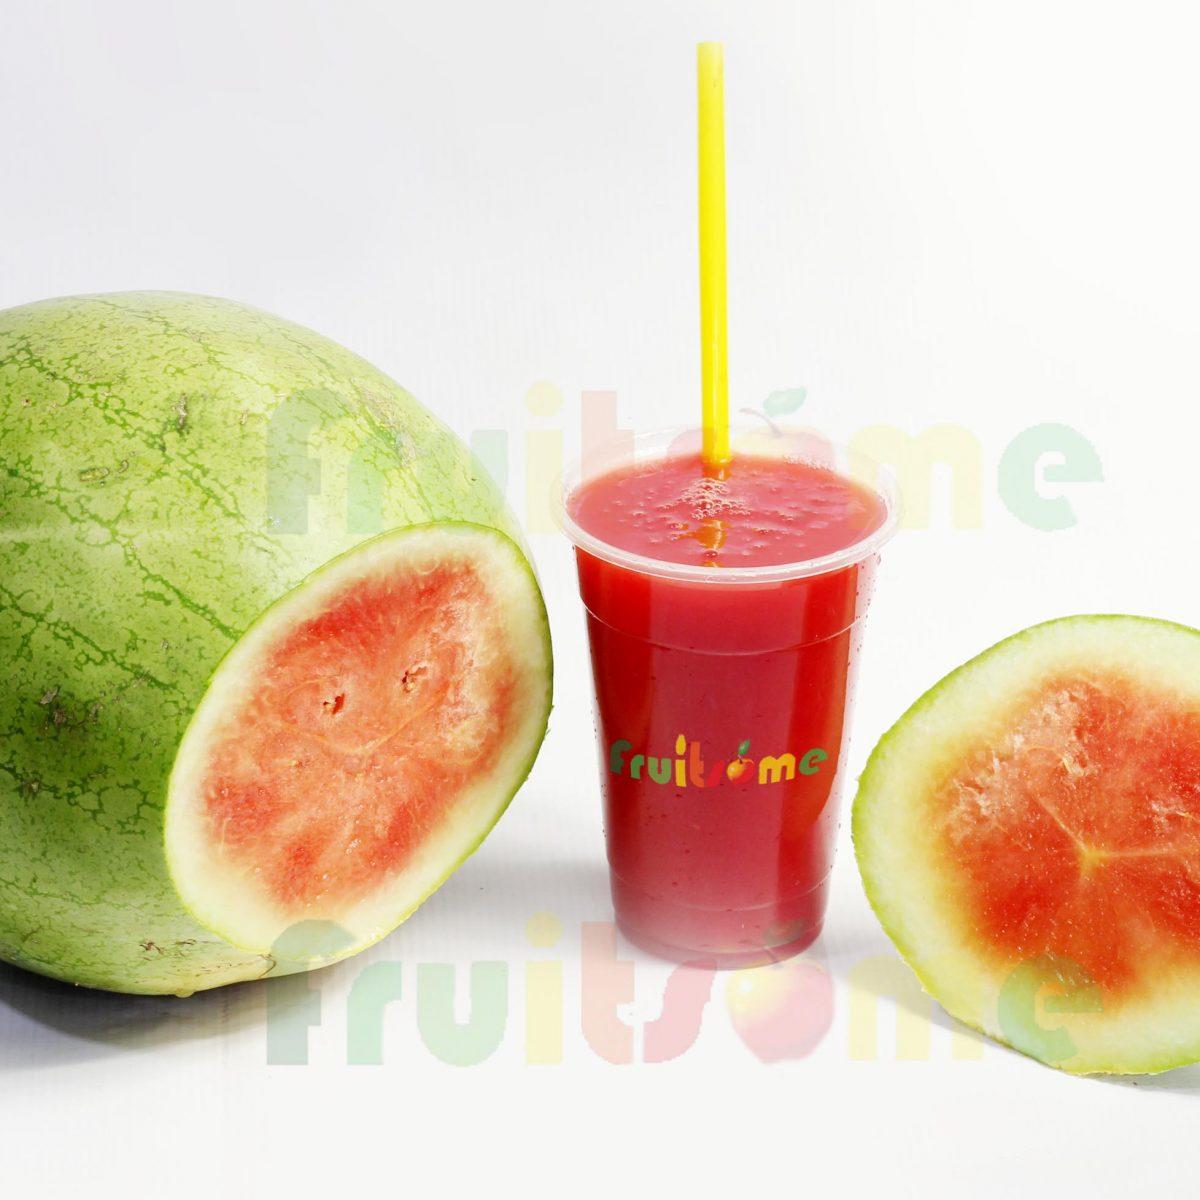 FRUITSOME SHOP RUBY DREAMER (CUP OR BOTTLE) 50CL N700.00, 1 LITRE N1,400.00